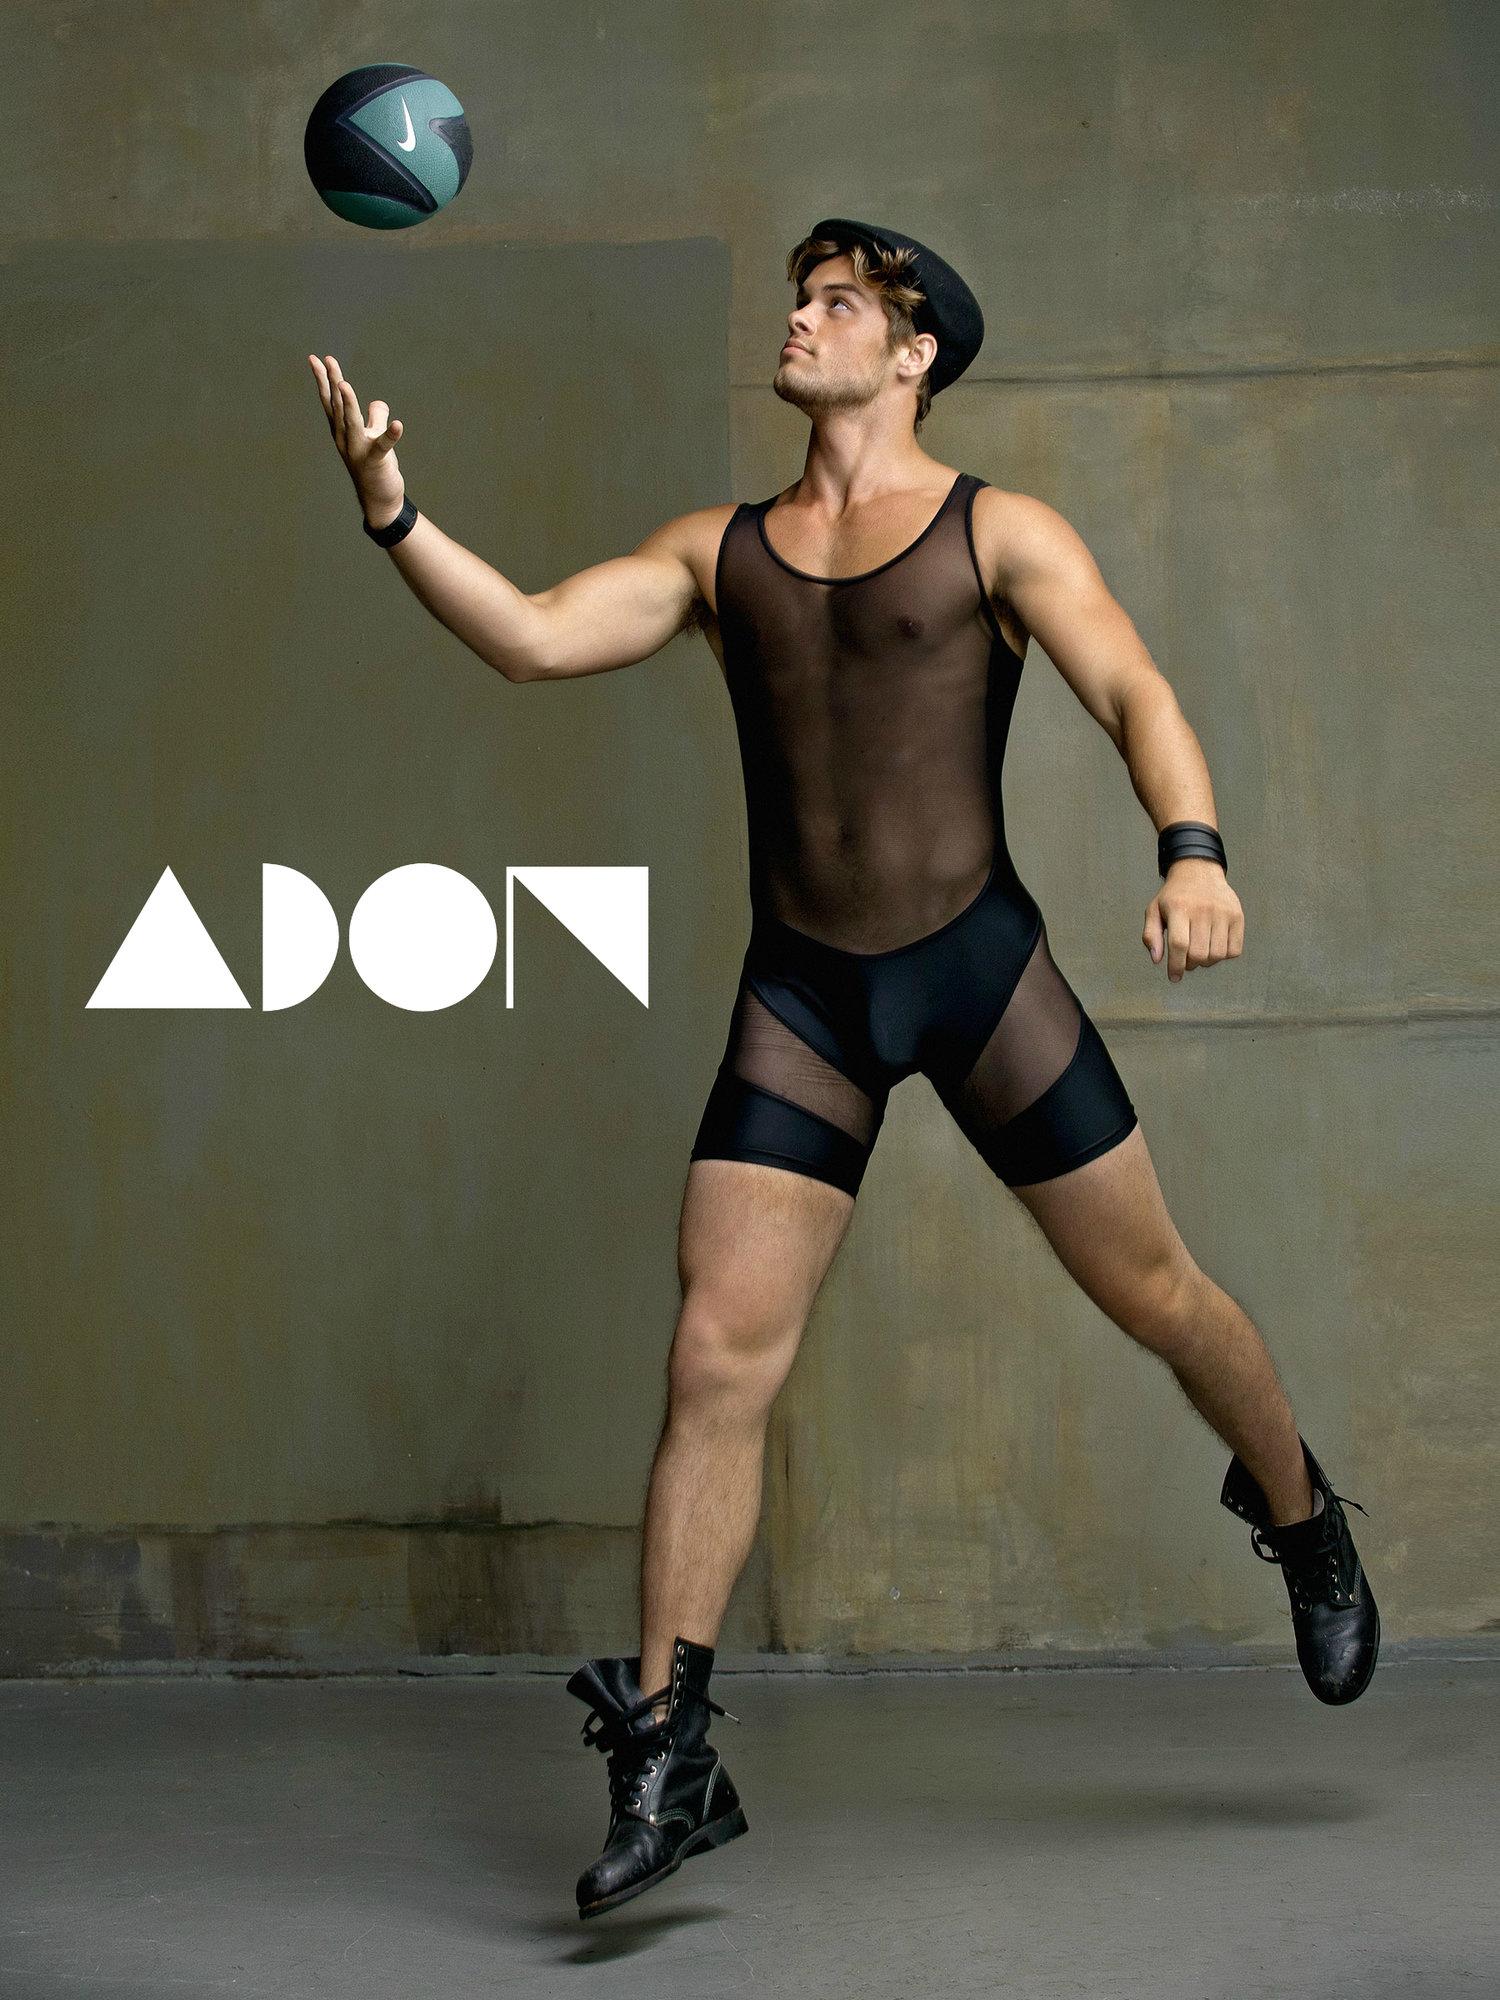 Adon Exclusive: Model Jack Weisensel By David Vance